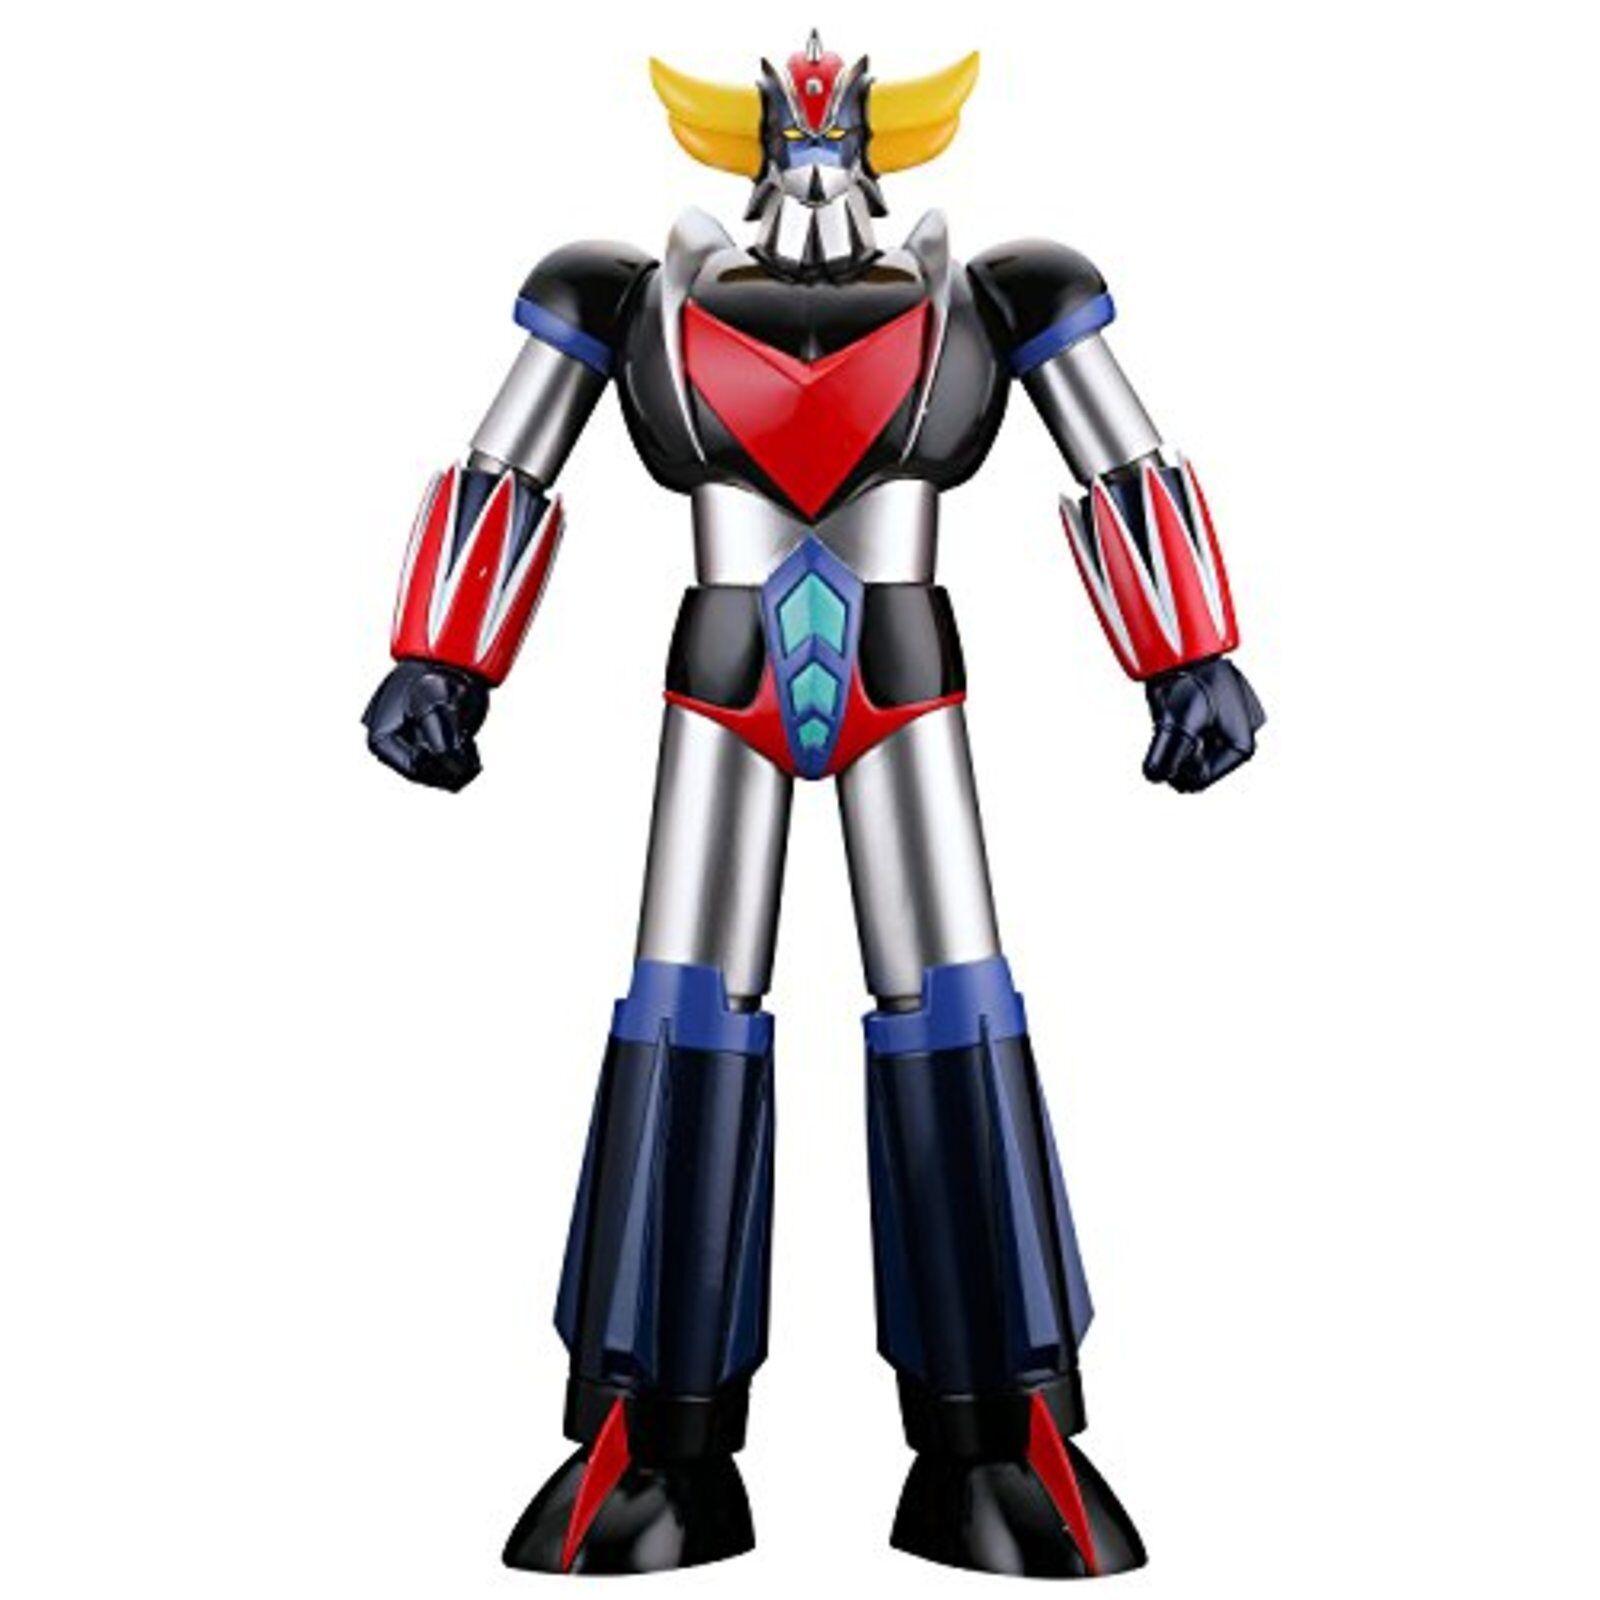 Kaiyodo Vinilo Suave Juguete Caja Hi-line 006 Ovni Robot Grendizer Figura F S con nº de seguimiento